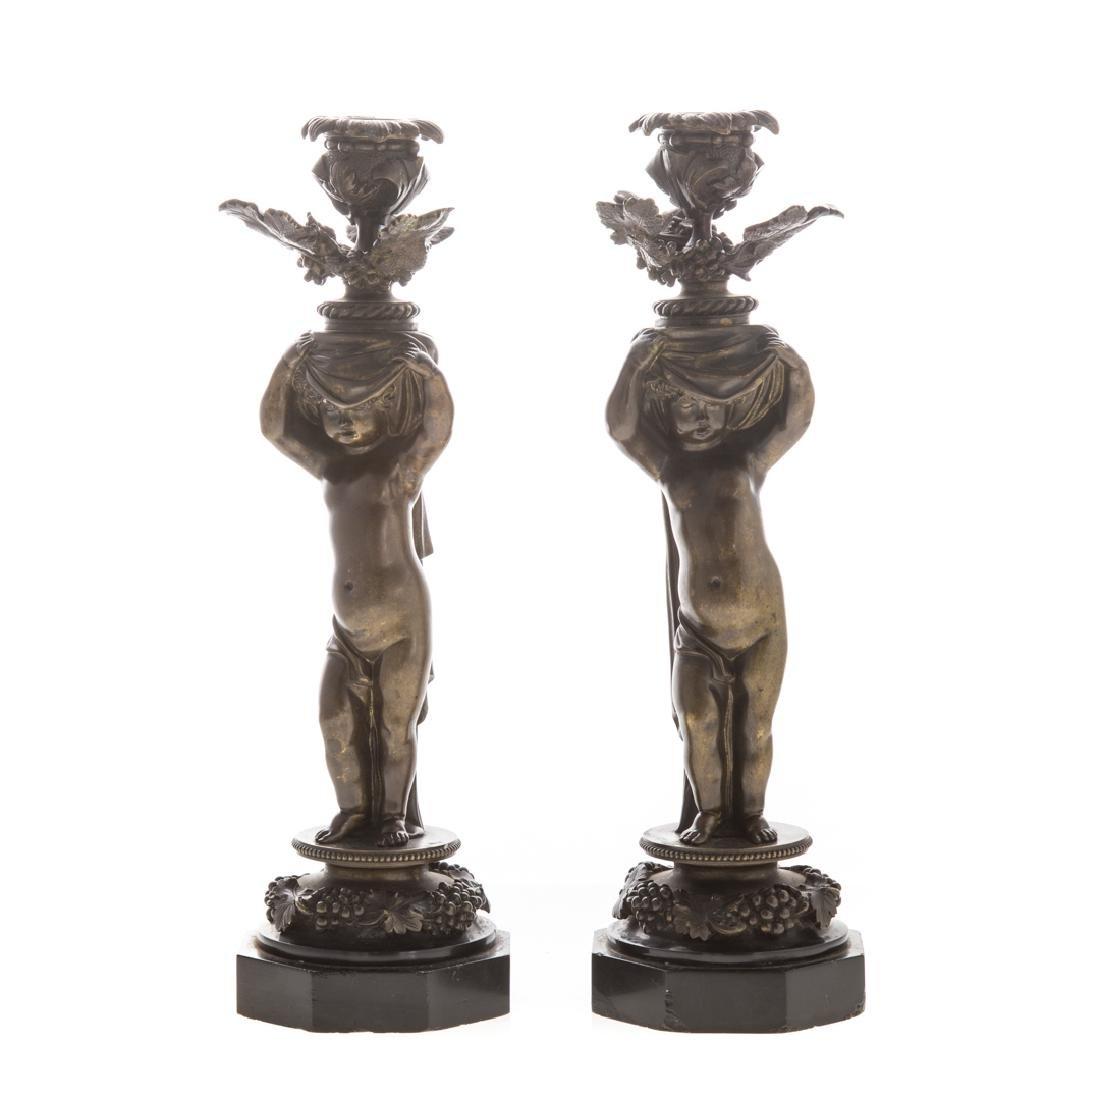 Pair of bronze putti candlesticks